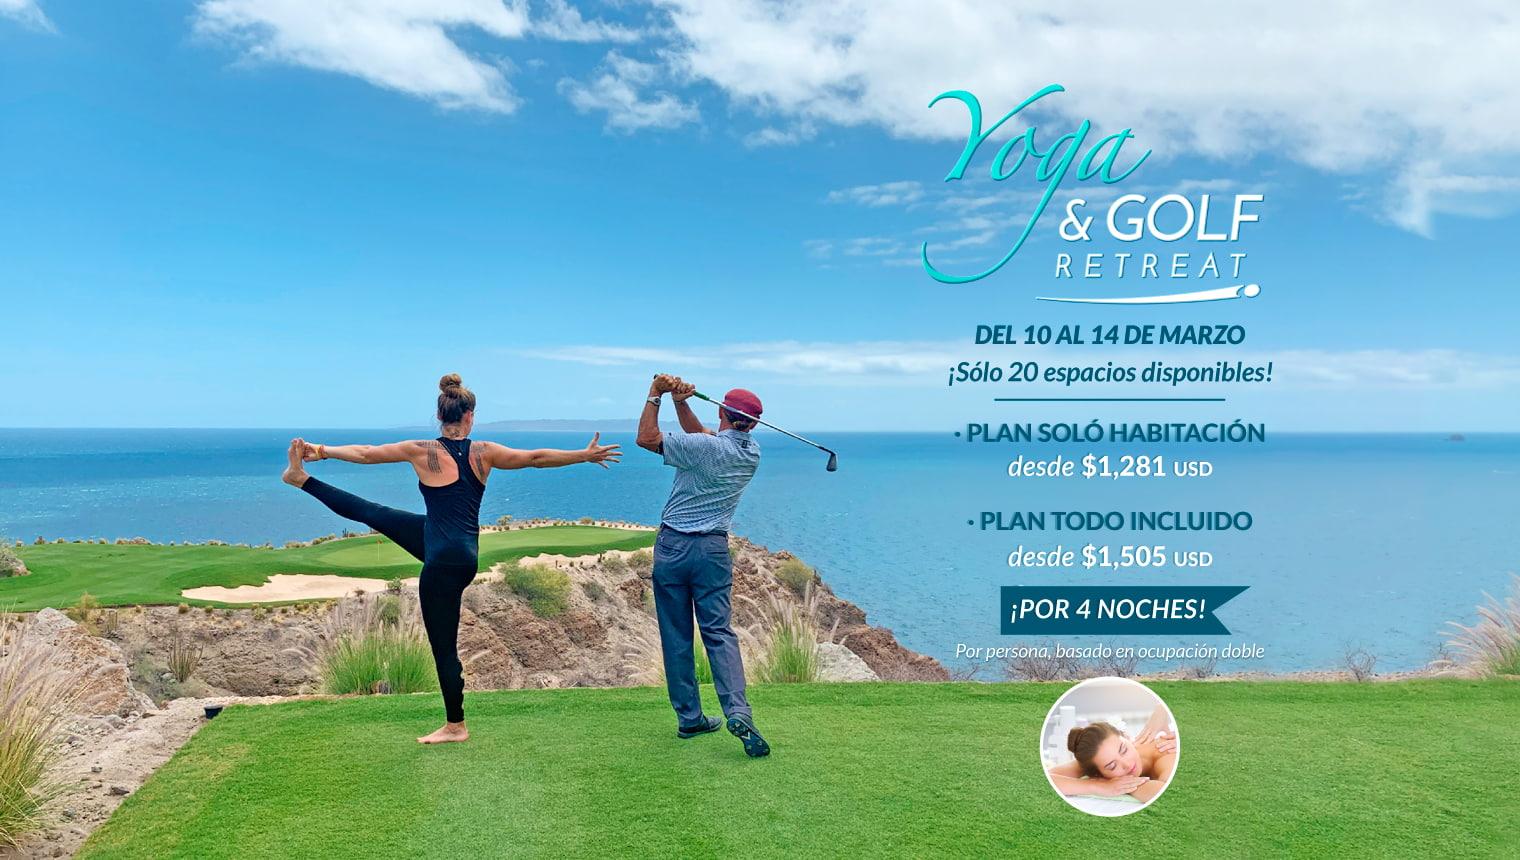 Yoga & Golf Retreat